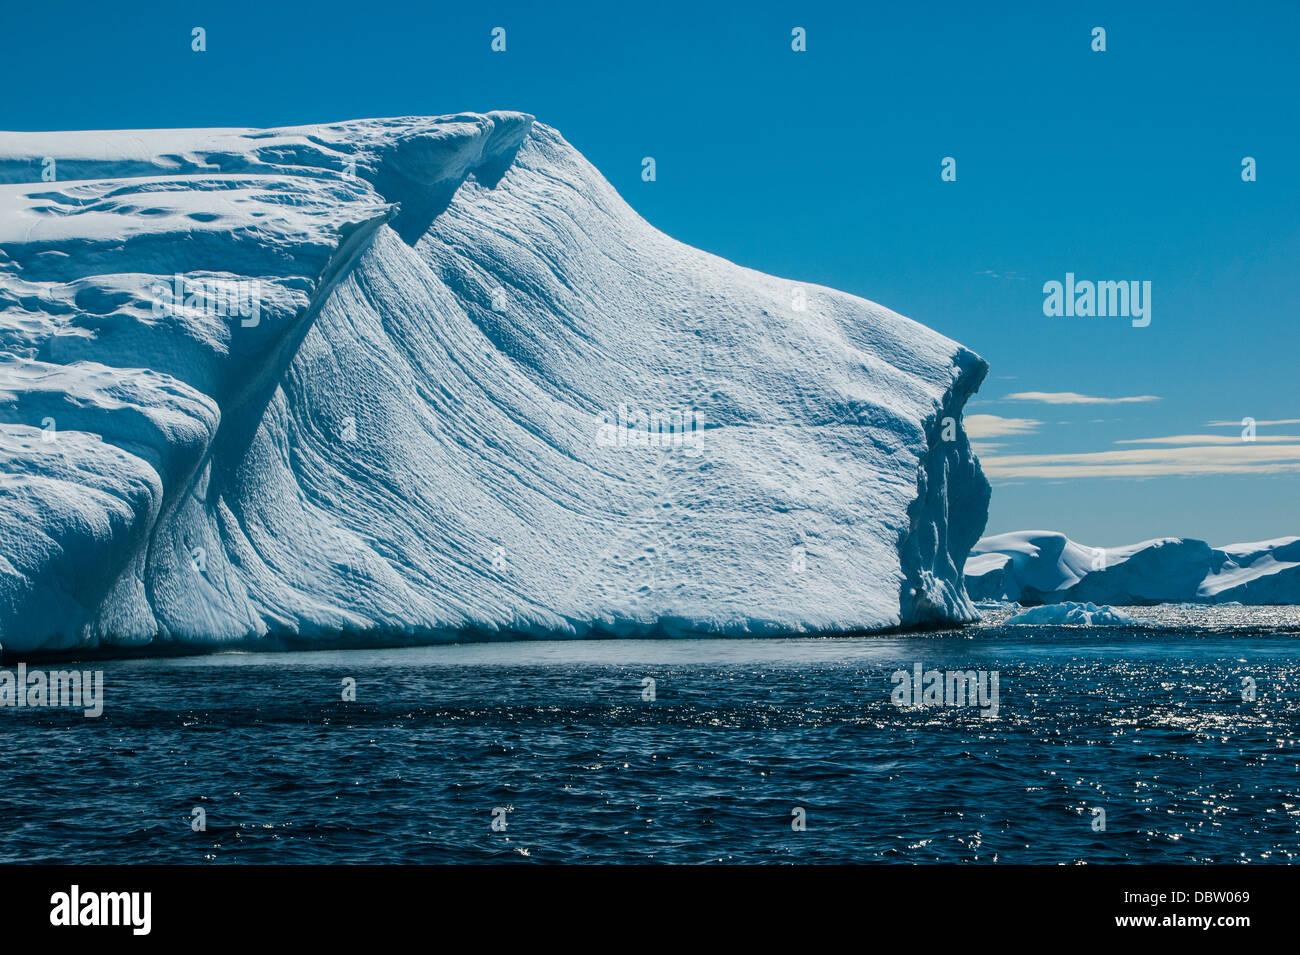 Iceberg, Cierva Cove, Antarctica, Polar Regions - Stock Image